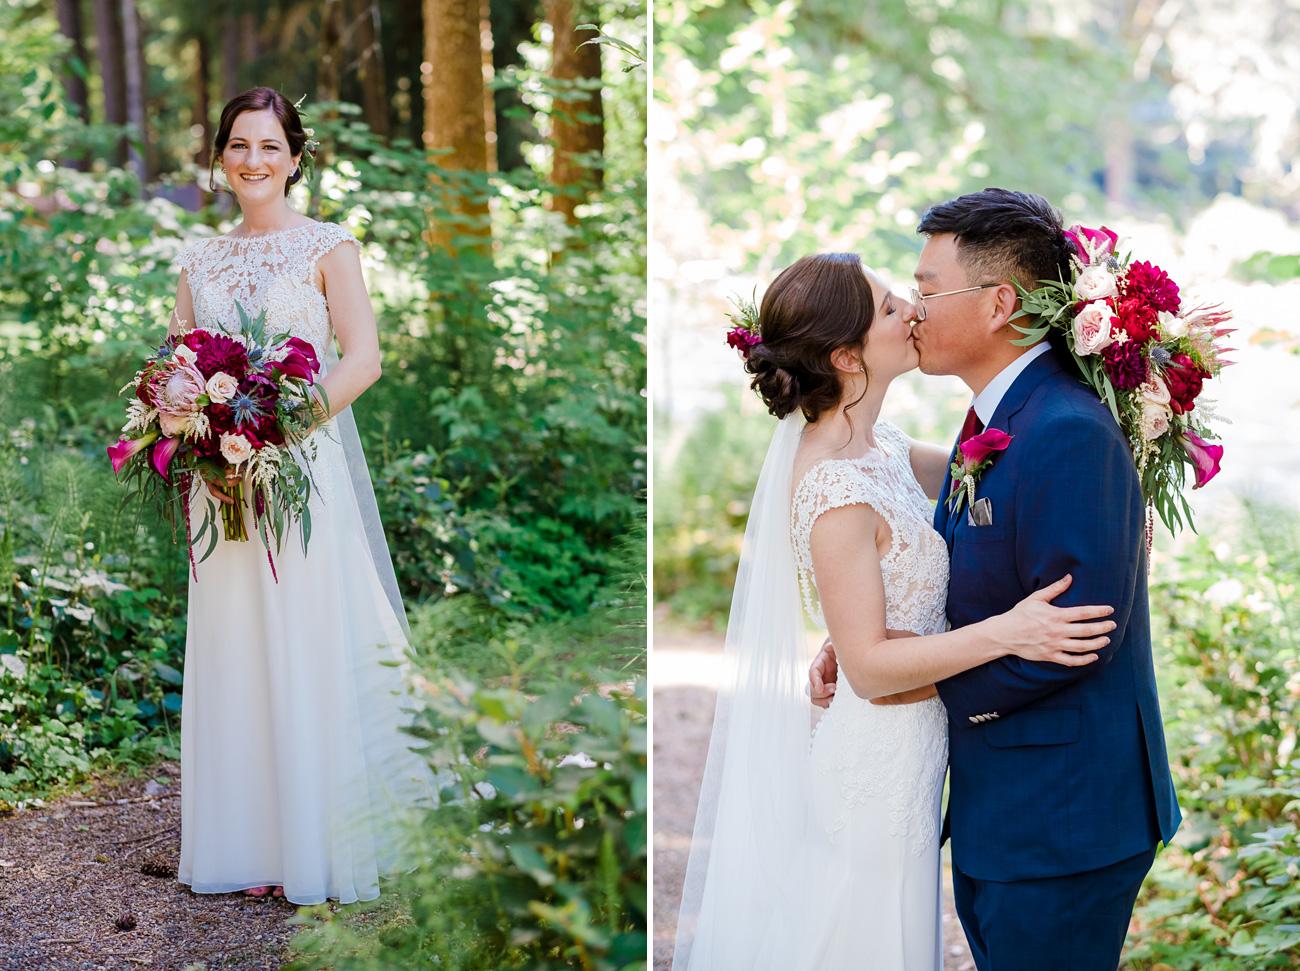 loloma-lodge-oregon-wedding-51 Loloma Lodge Oregon Wedding | Anna & Justin | Traditional Korean Tea Ceremony